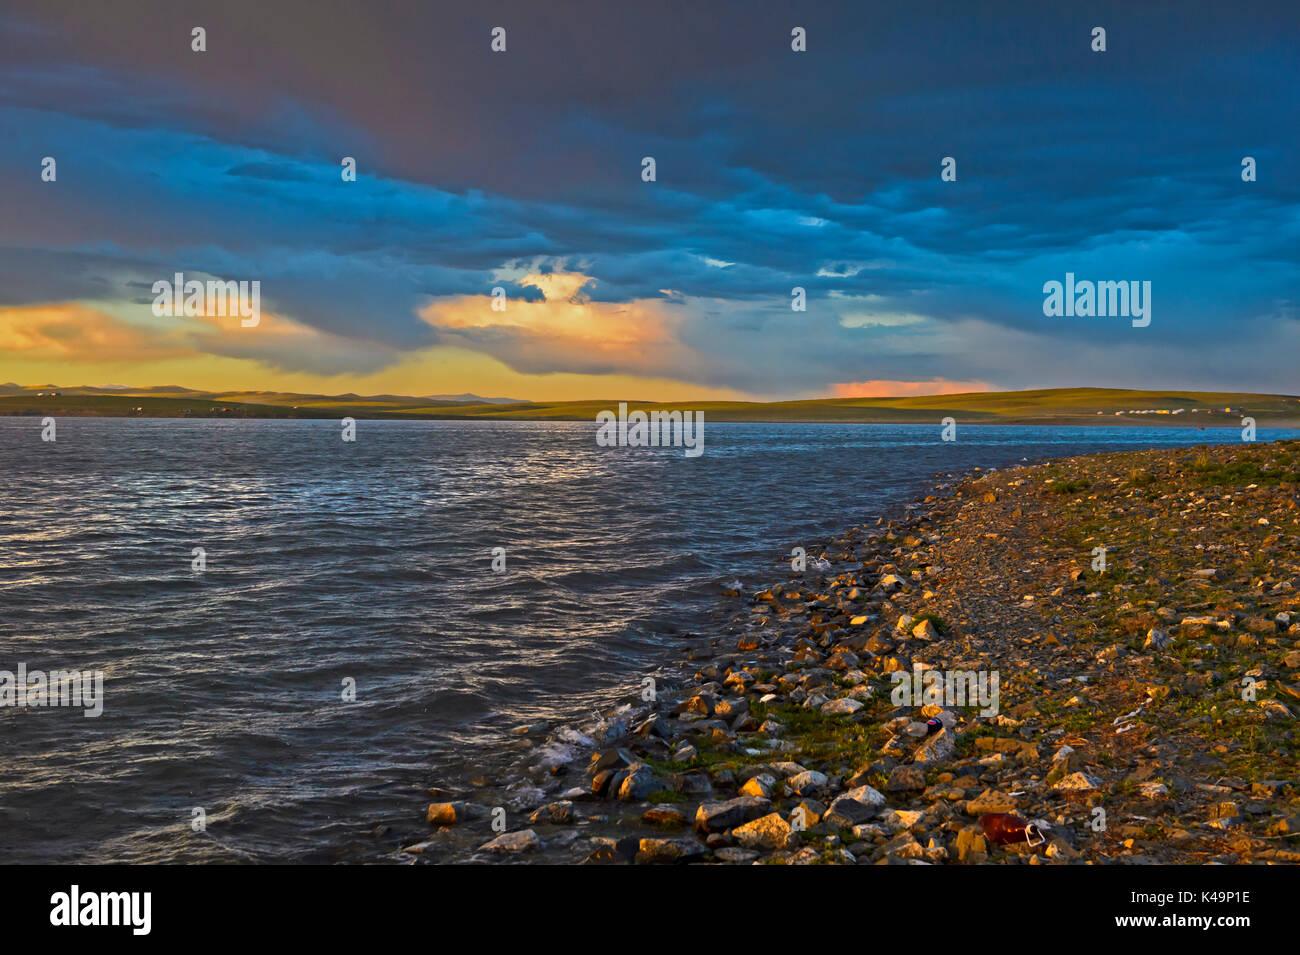 Sunset At Lake Ogii Nuur, Mongolia - Stock Image